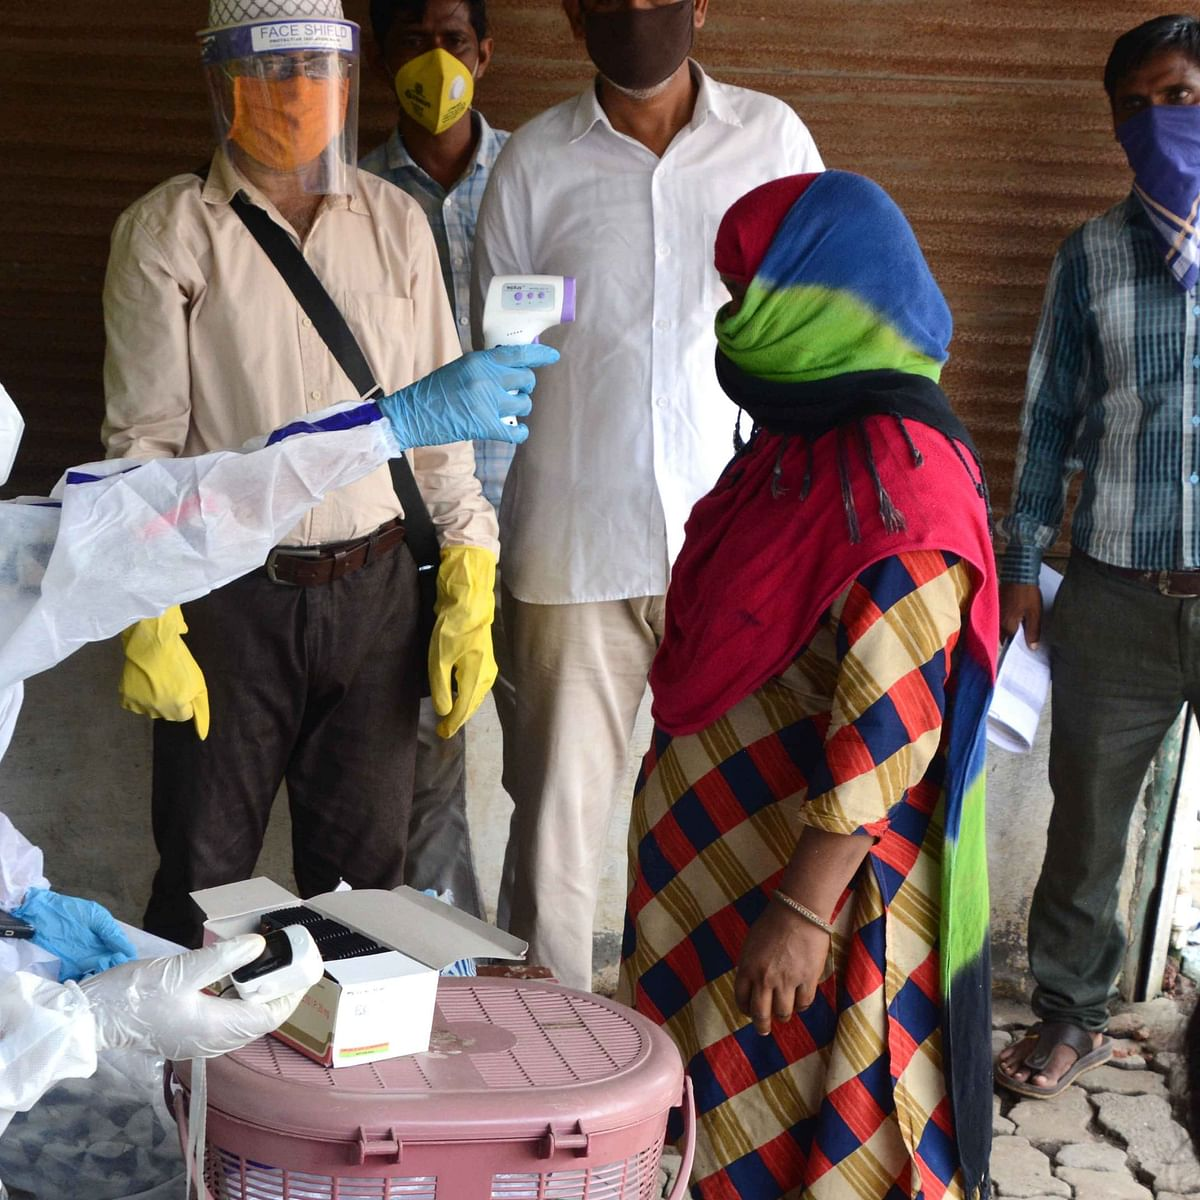 Coronavirus in Bhopal: City records 242 new COVID-19 cases, tally rises to 12,270